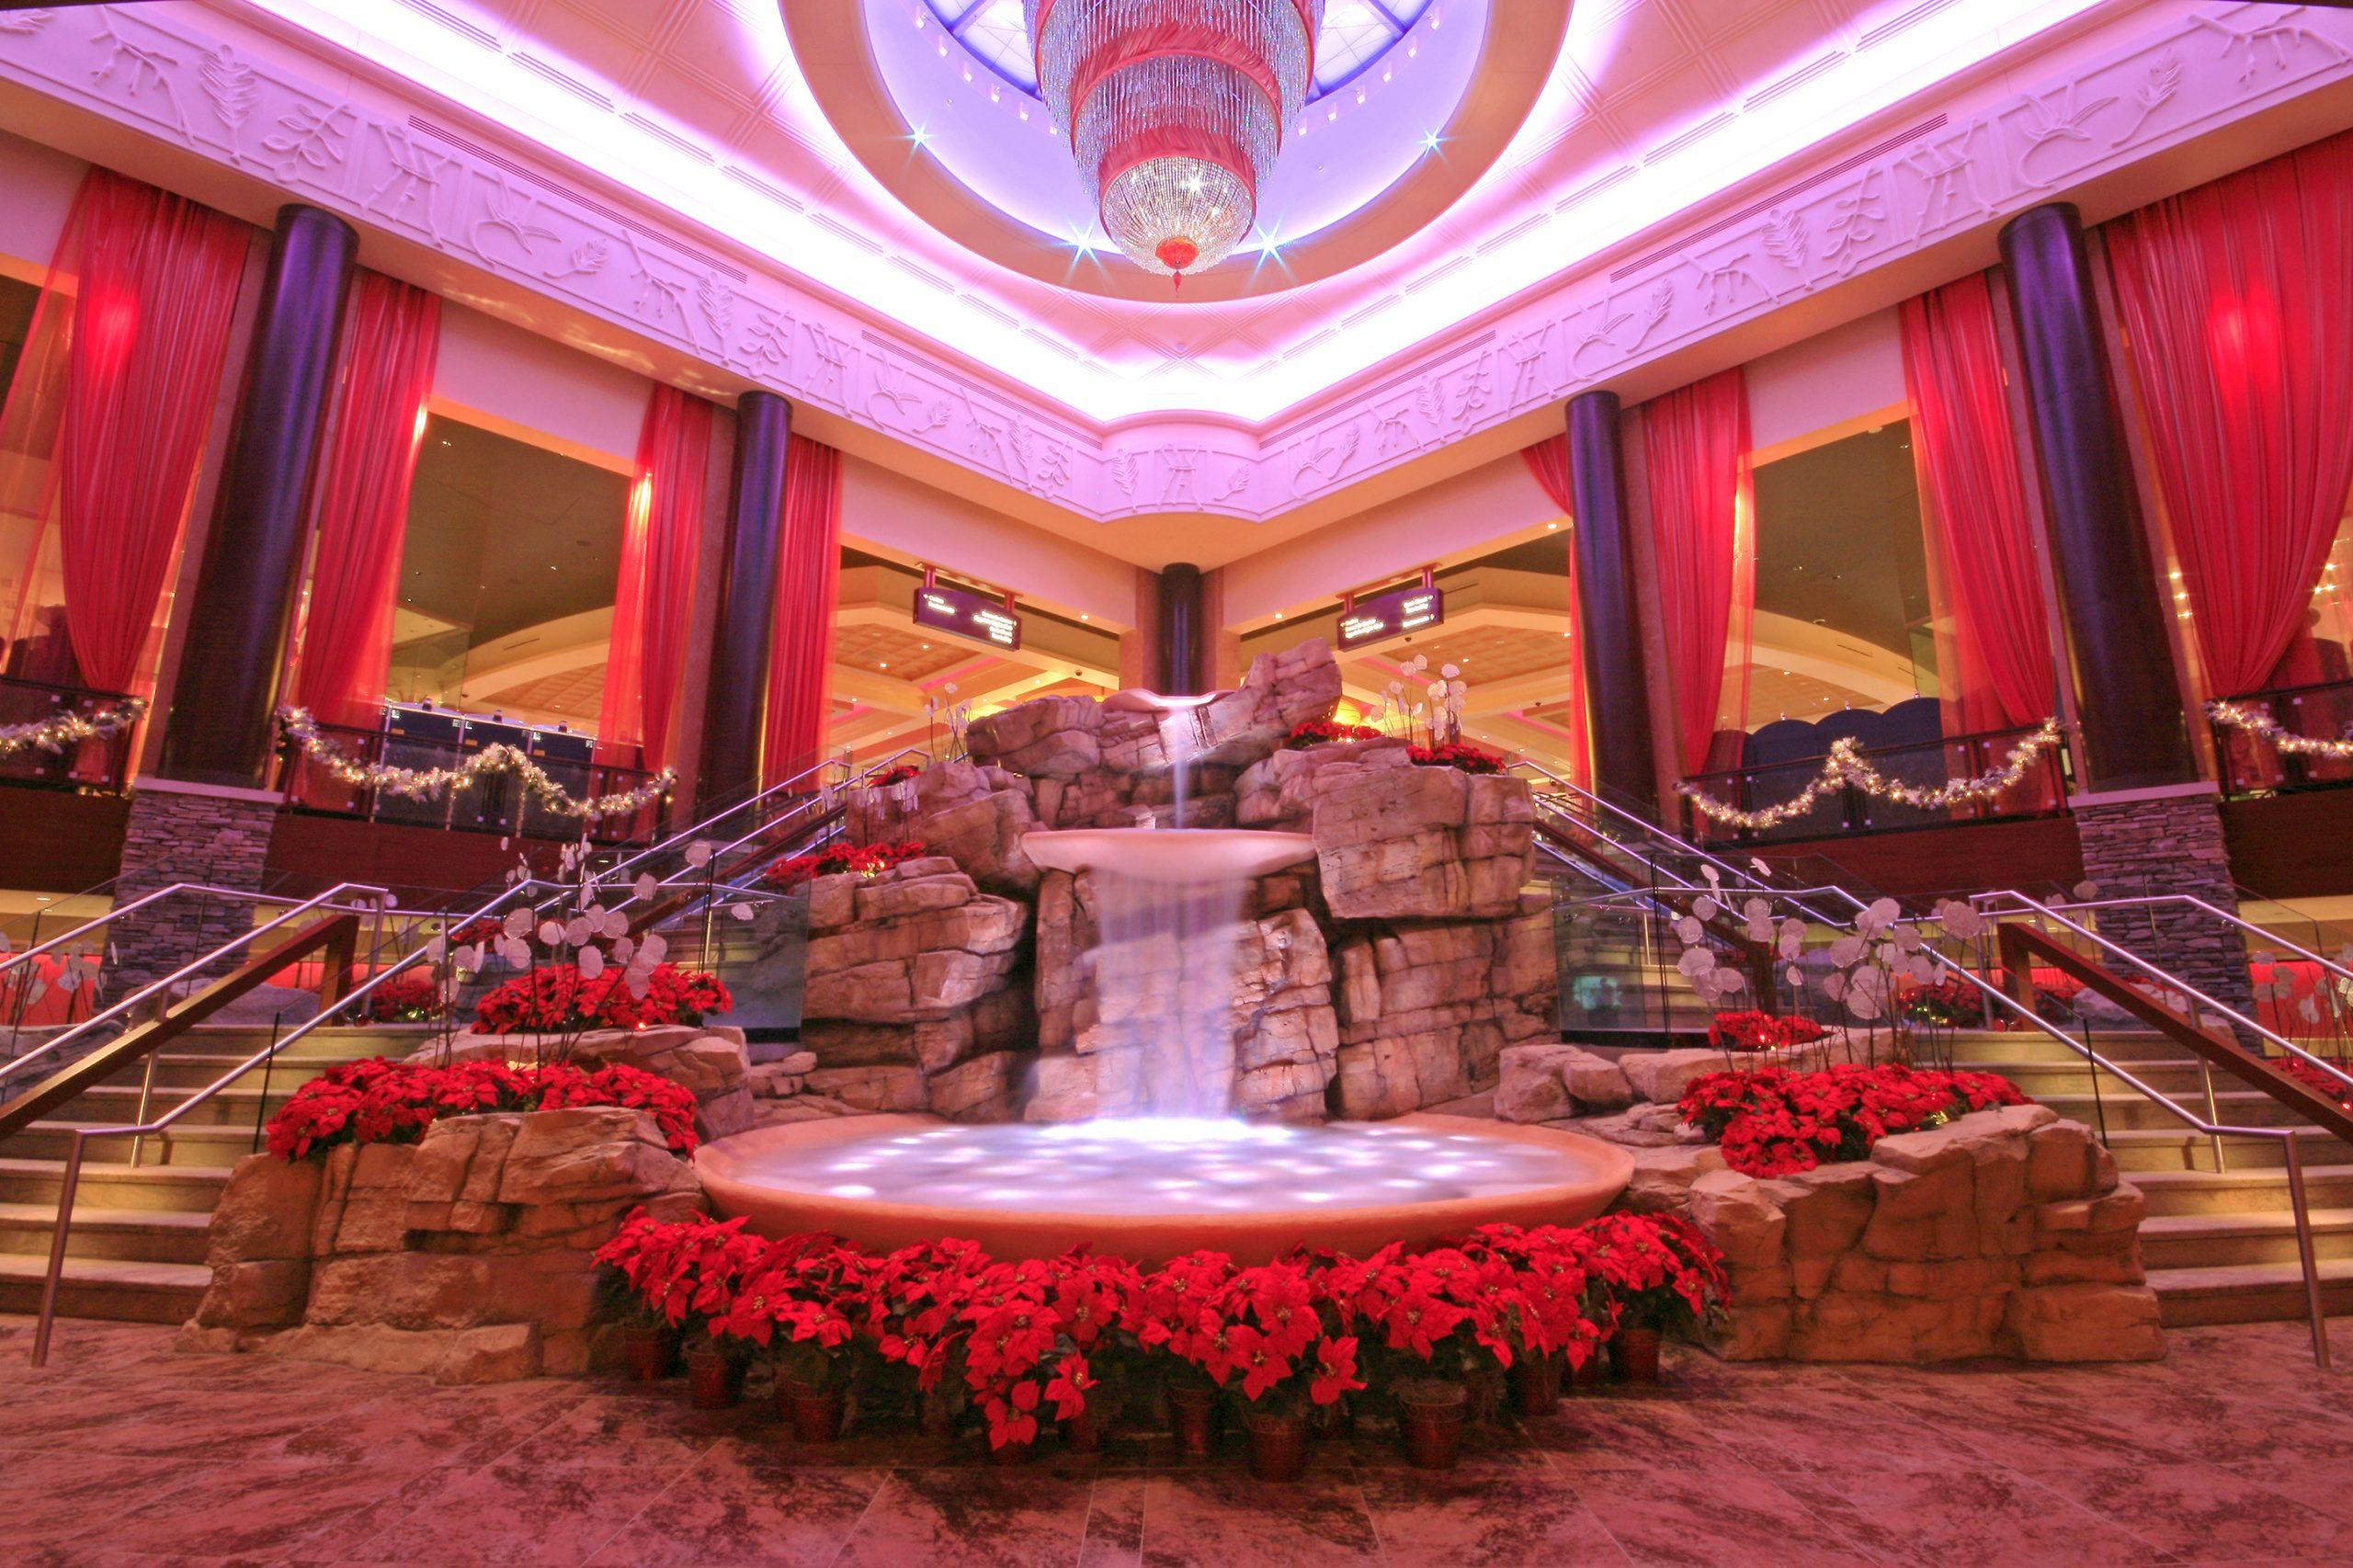 Mount Airy Casino Winter decor